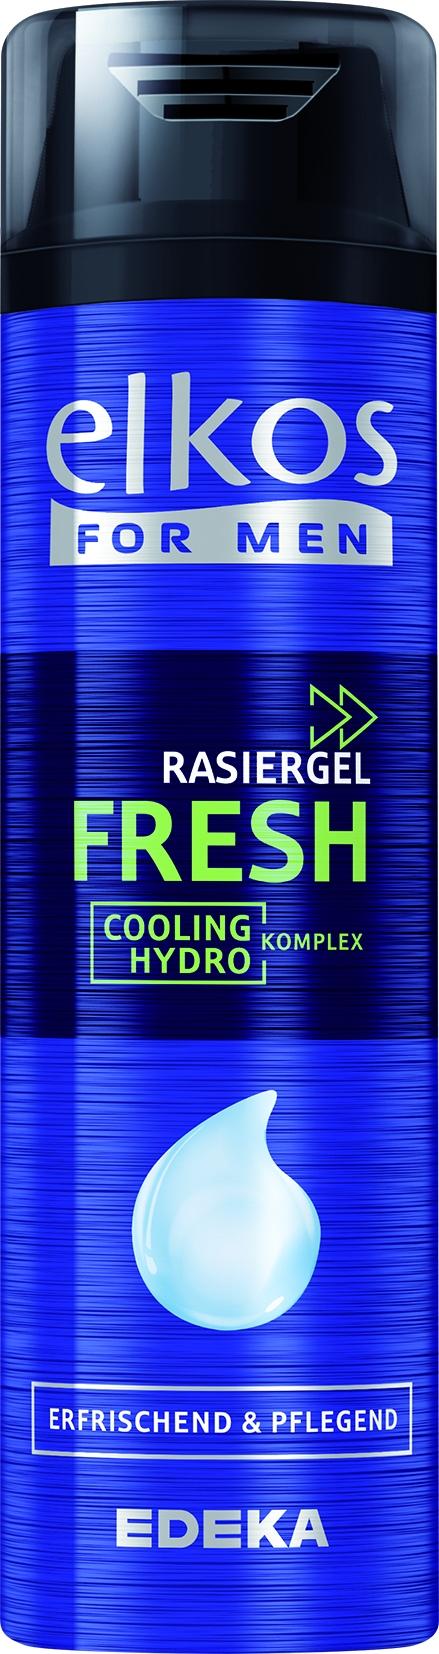 Rasiergel Fresh